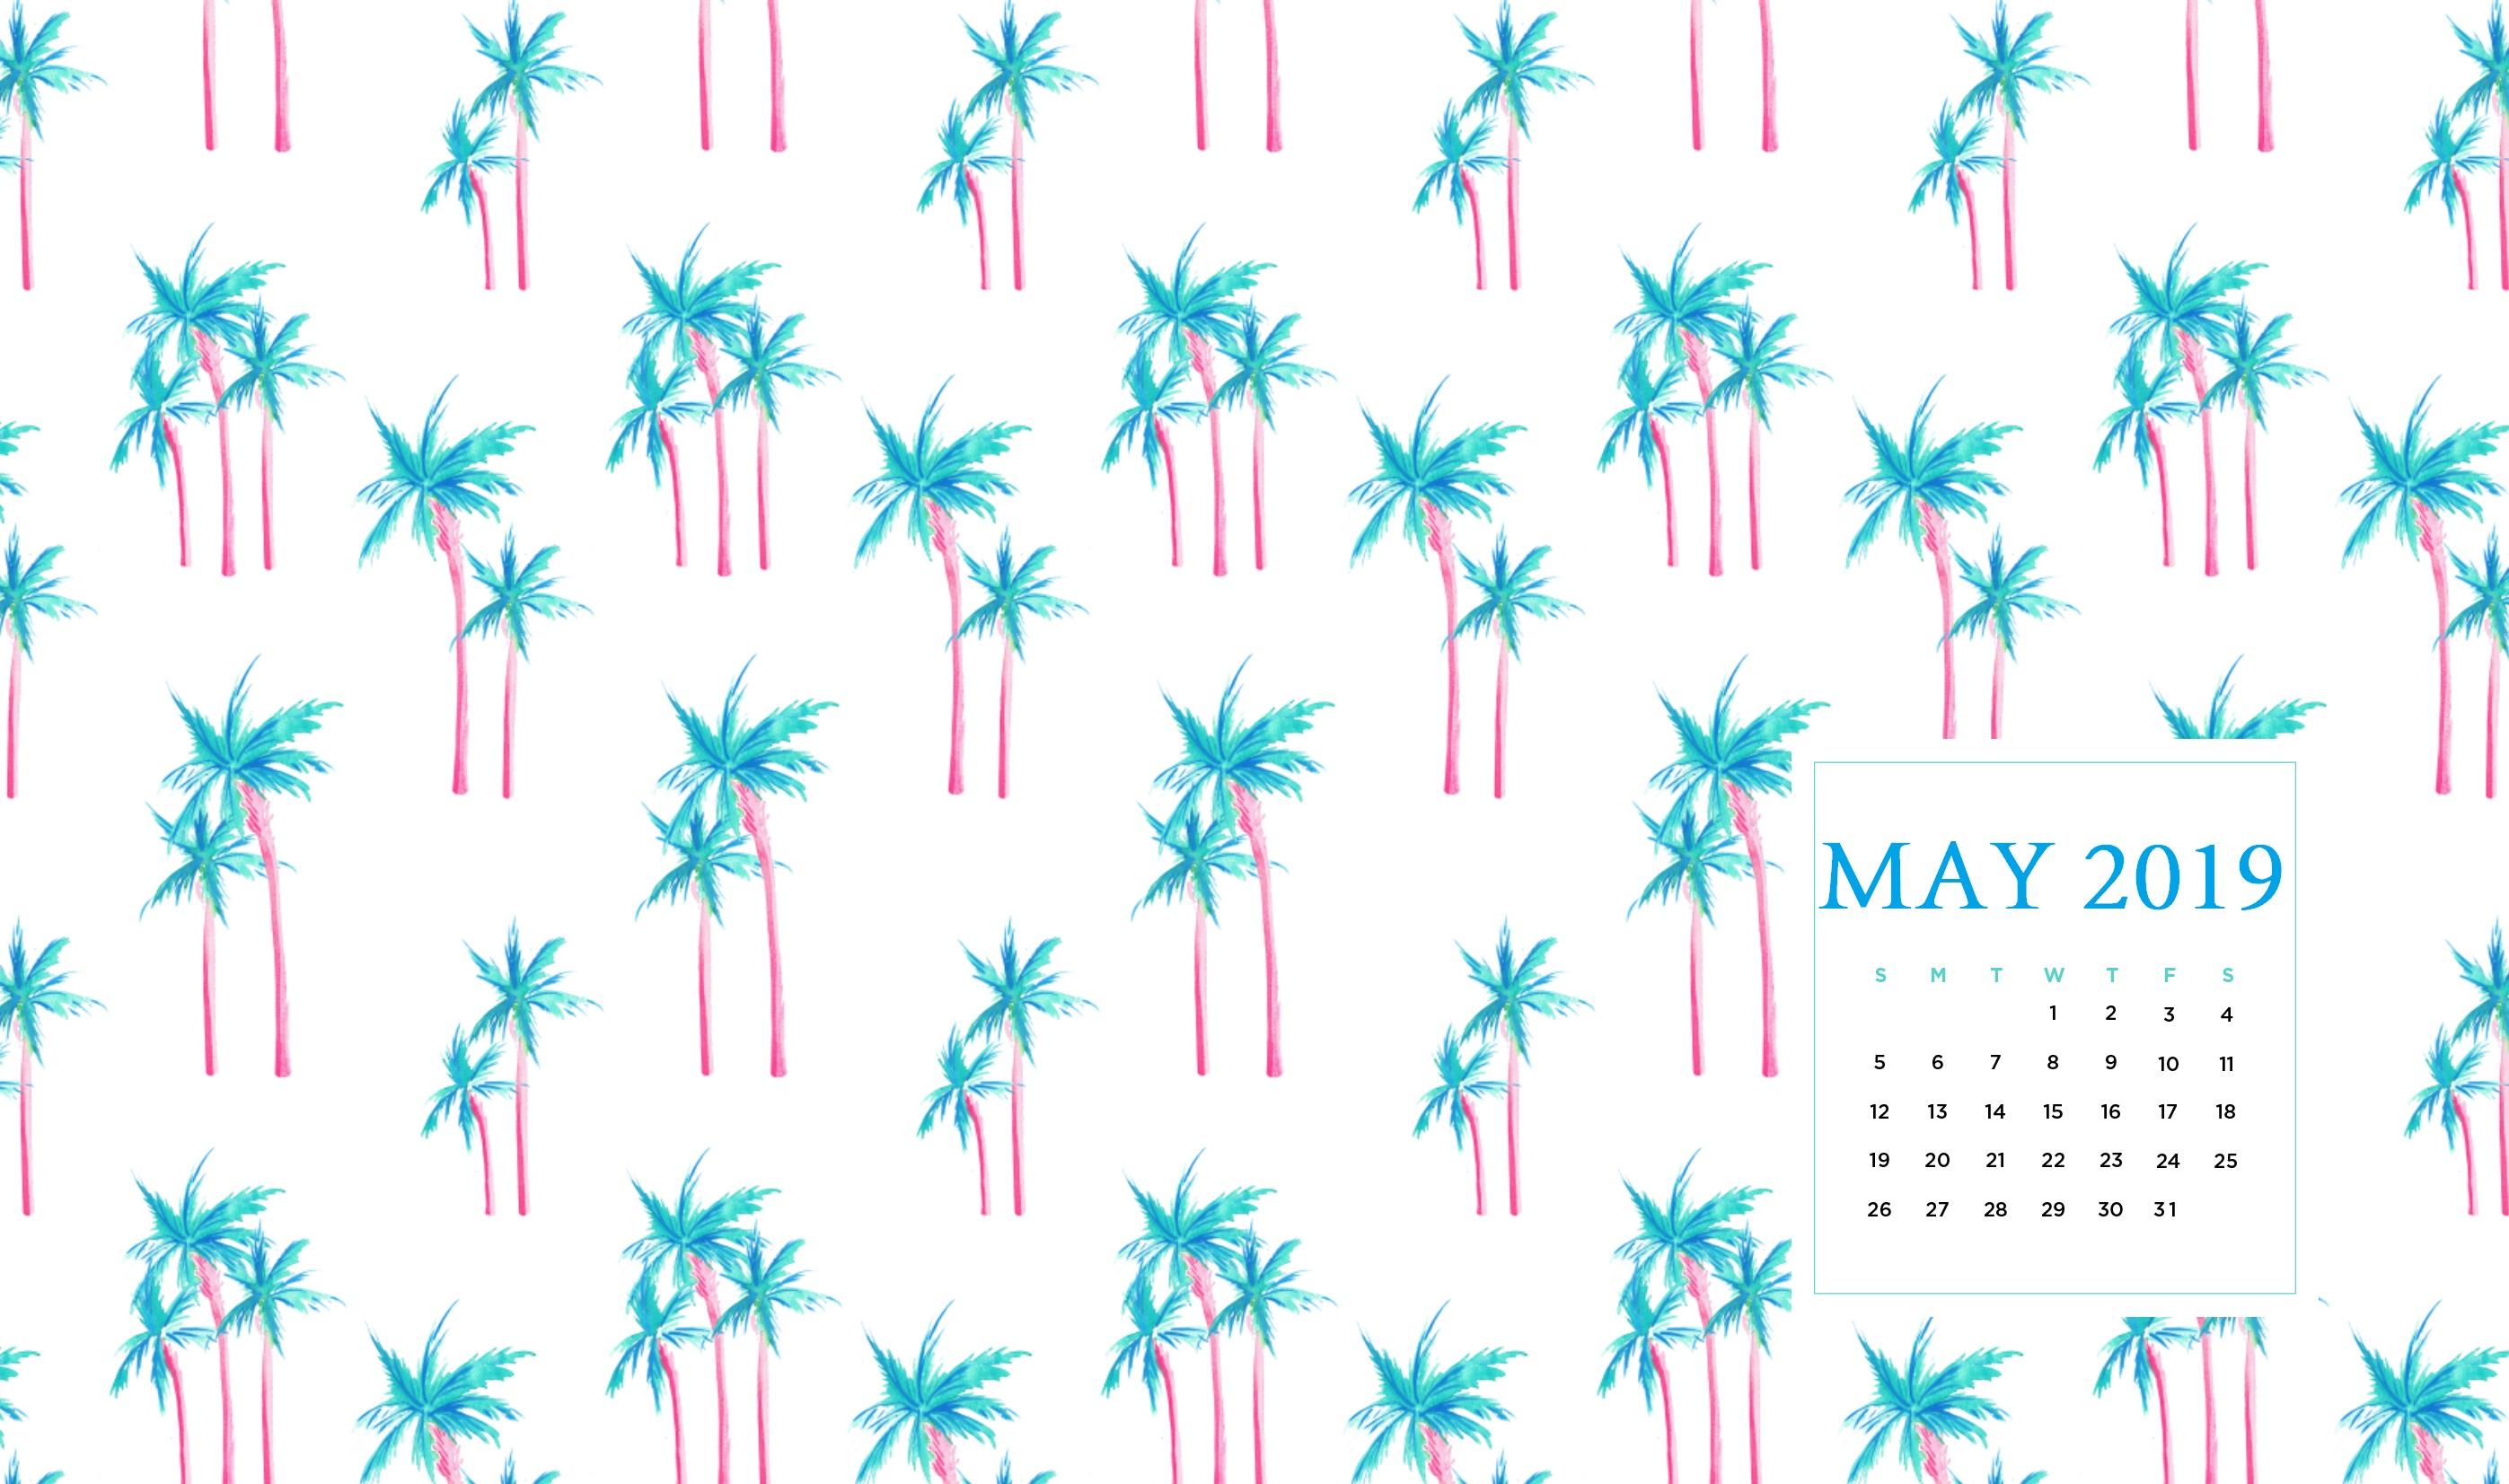 May 2019 Desktop Calendar Backgrounds Max Calendars 2794x1653